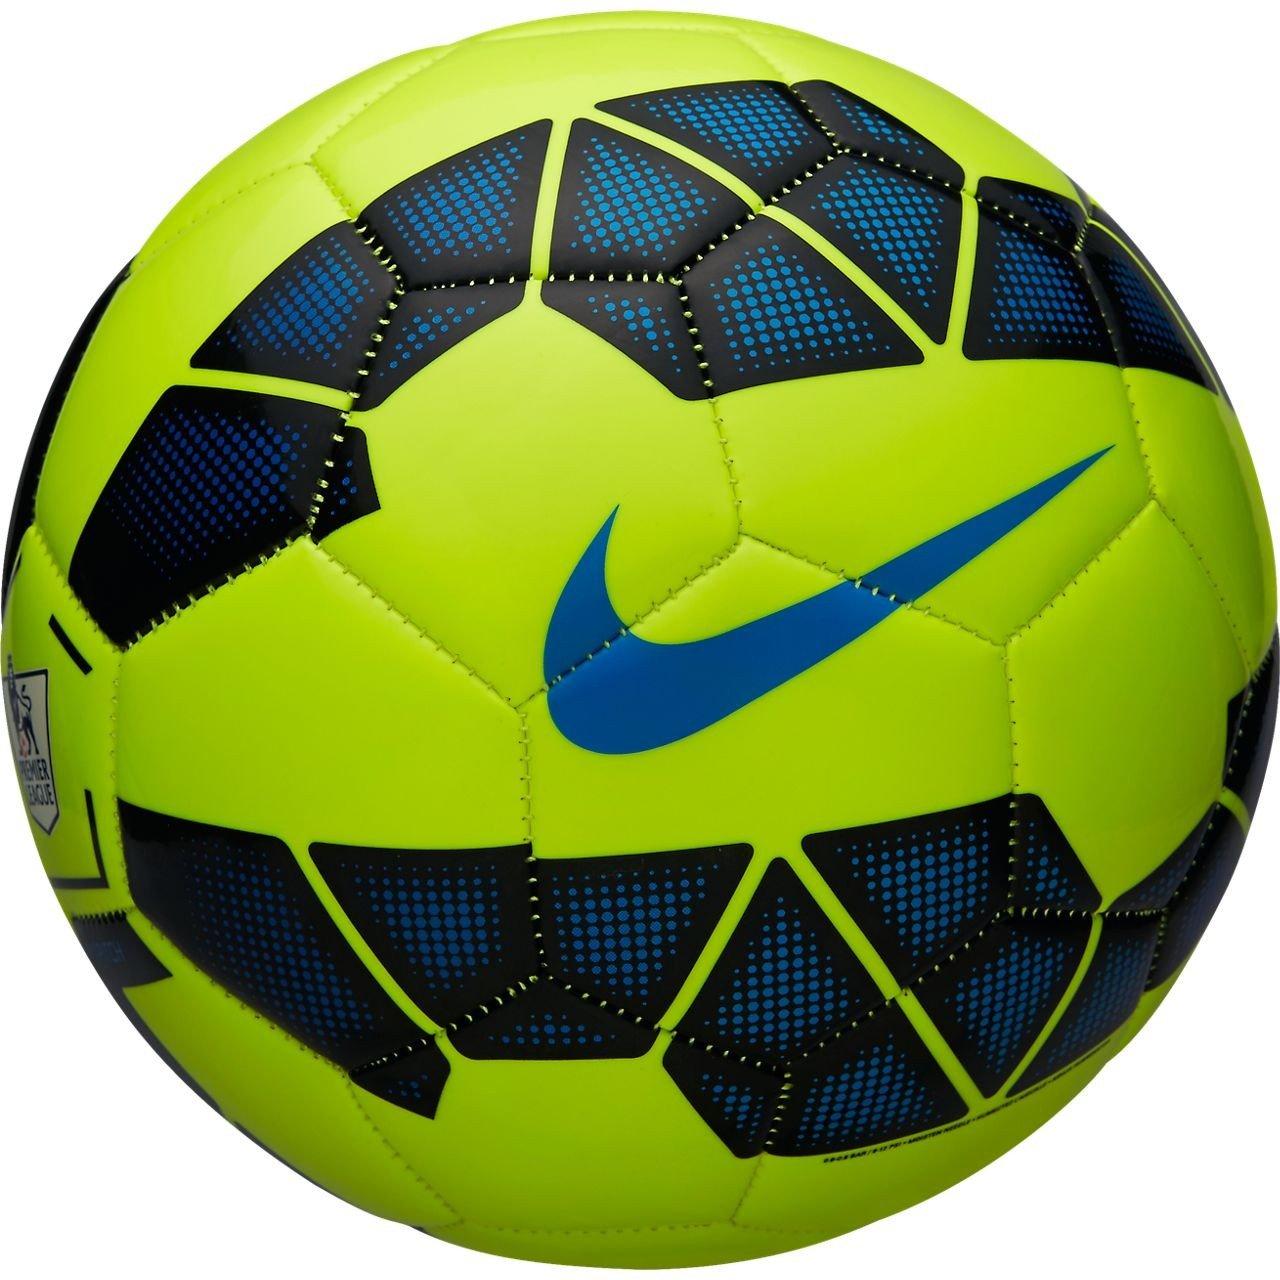 NikeサッカーボールピッチEPL B00JG6DJWUVolt/Black/Blue/Blue 5